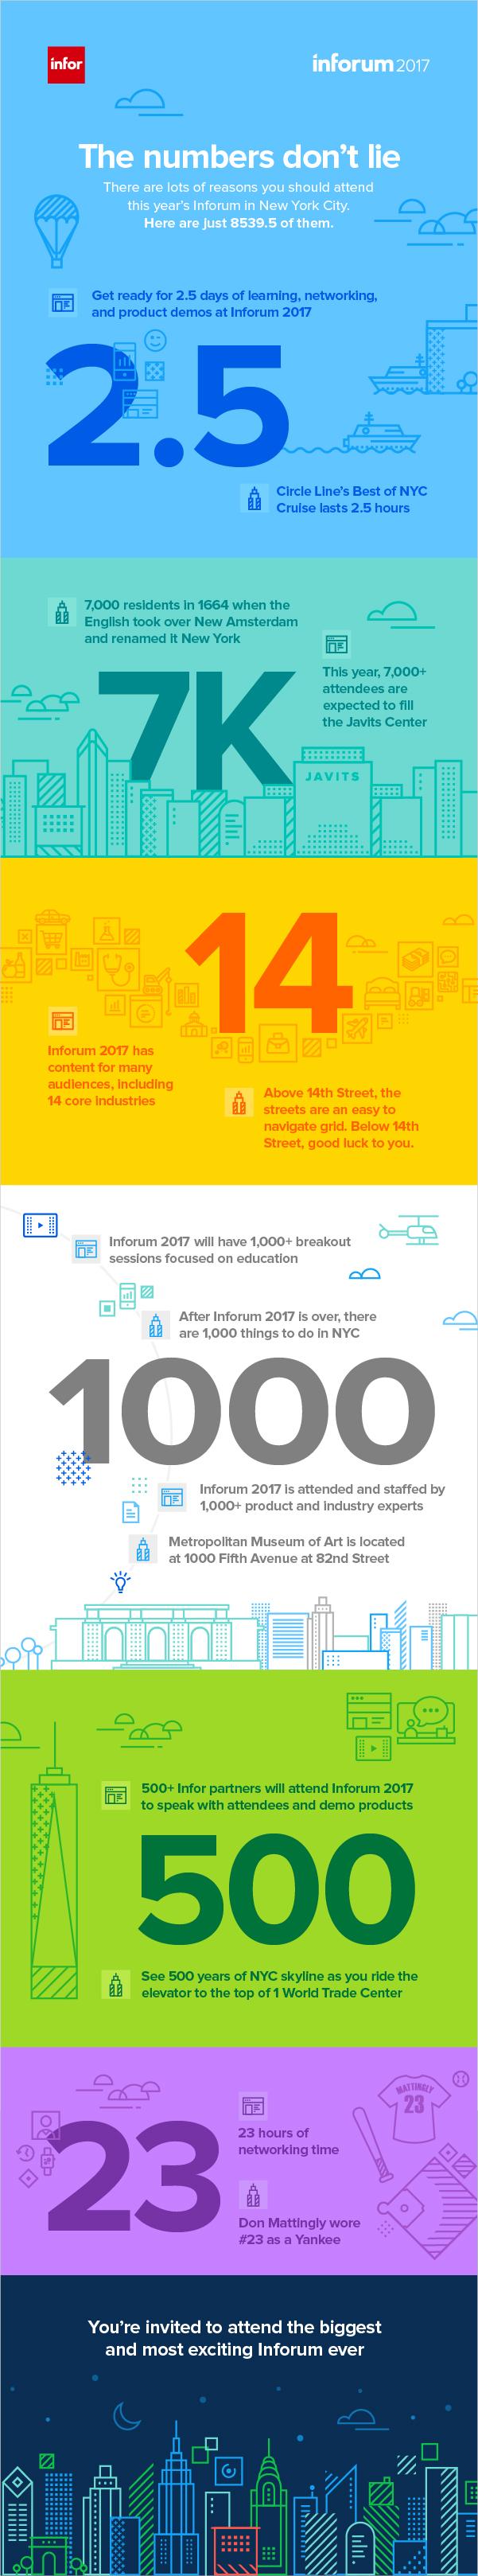 Inforum_2017_Infographic.jpg